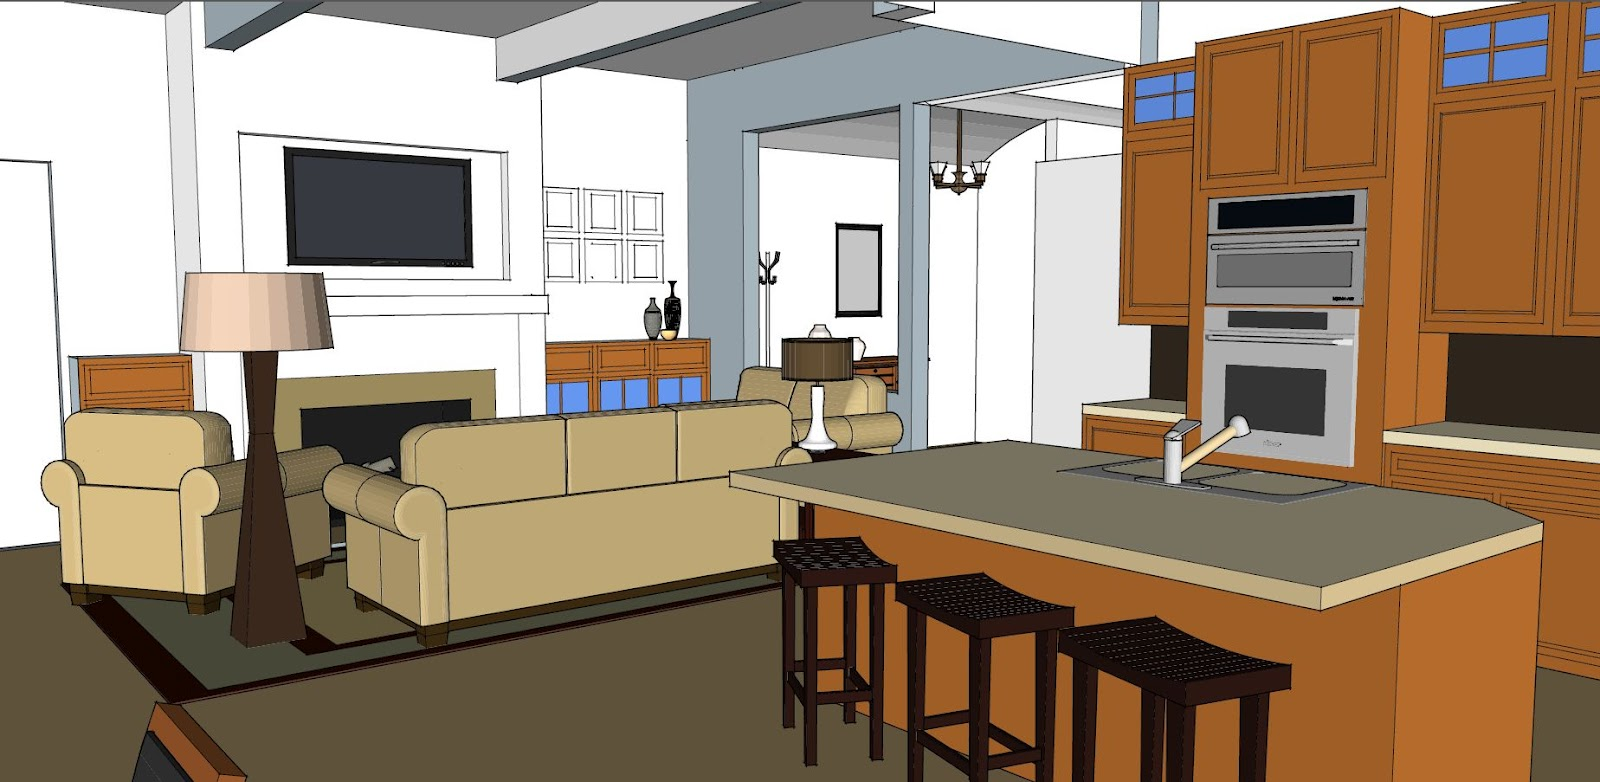 Beth c davis for Kitchen designs sketchup